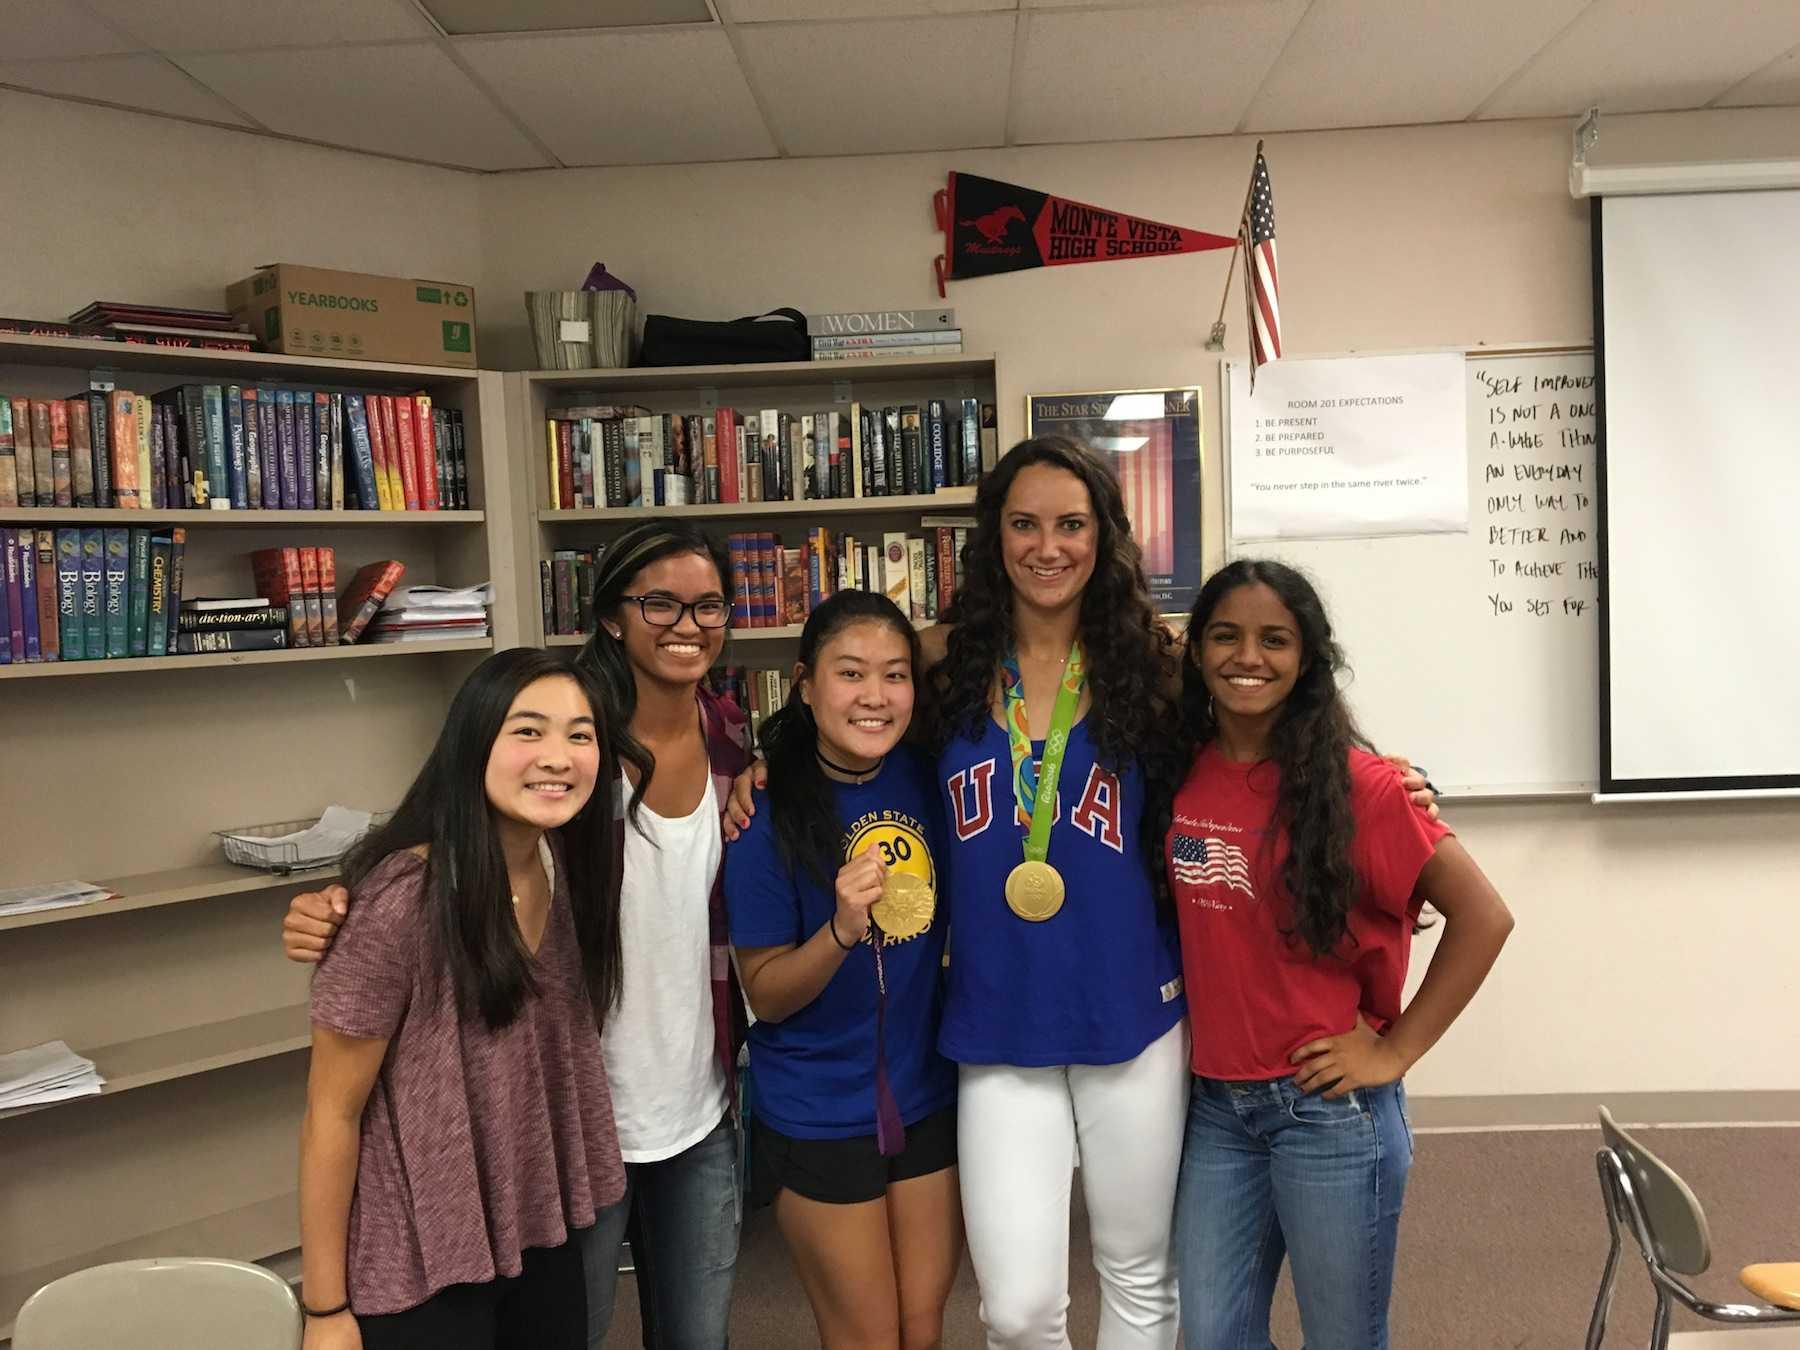 Maggie Steffens poses with Megan Okazaki, Katrina Flores, Taylor Okazaki, and Isha Satoor after school in Mr. Powers' room. (Courtesy of Megan Okazaki)